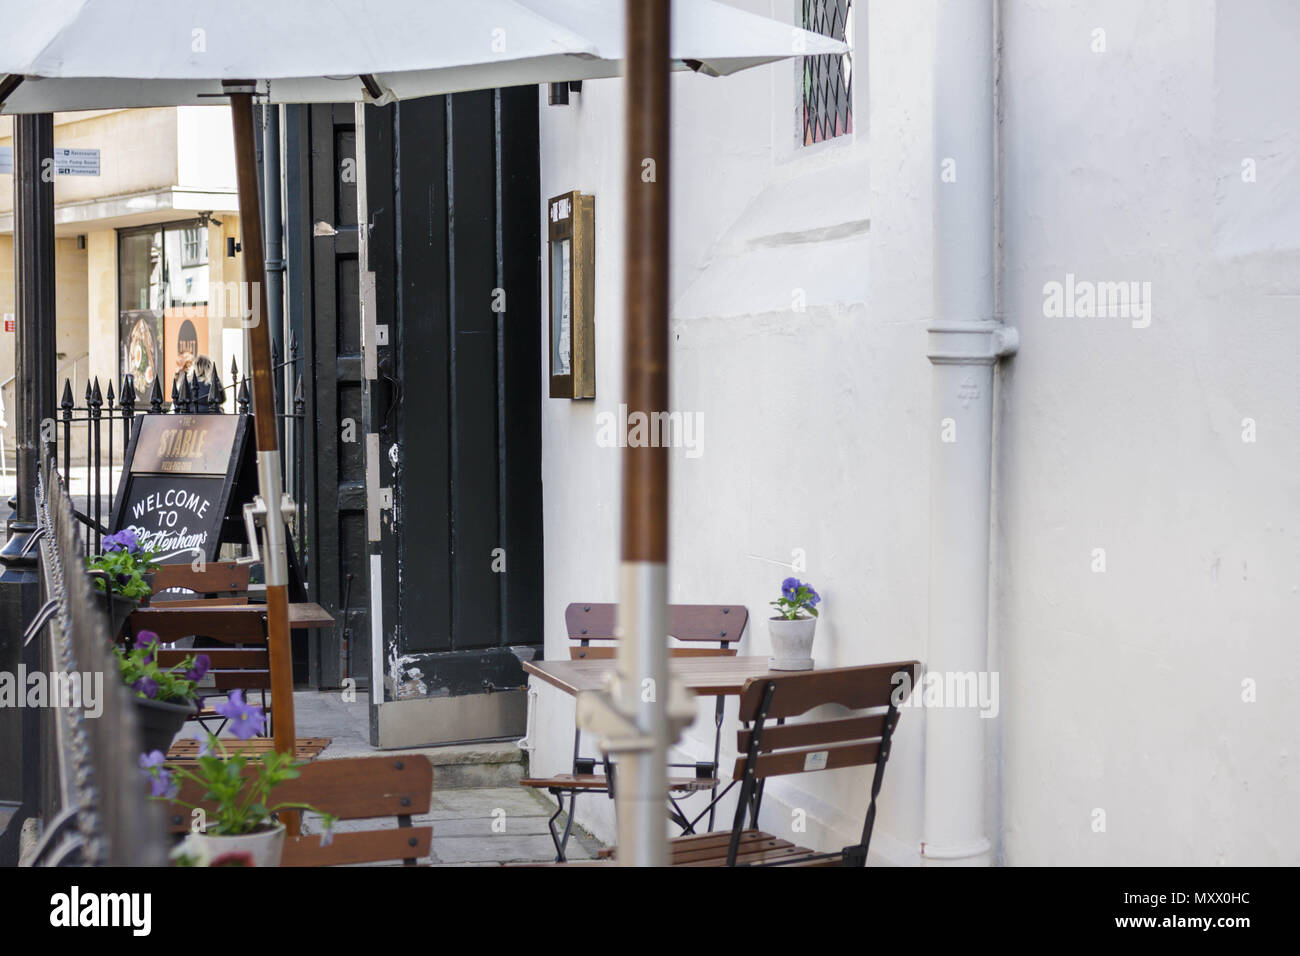 Street scene in a regency town in the UK. Image showing buildings, walls, shops, plants. Urban image. - Stock Image